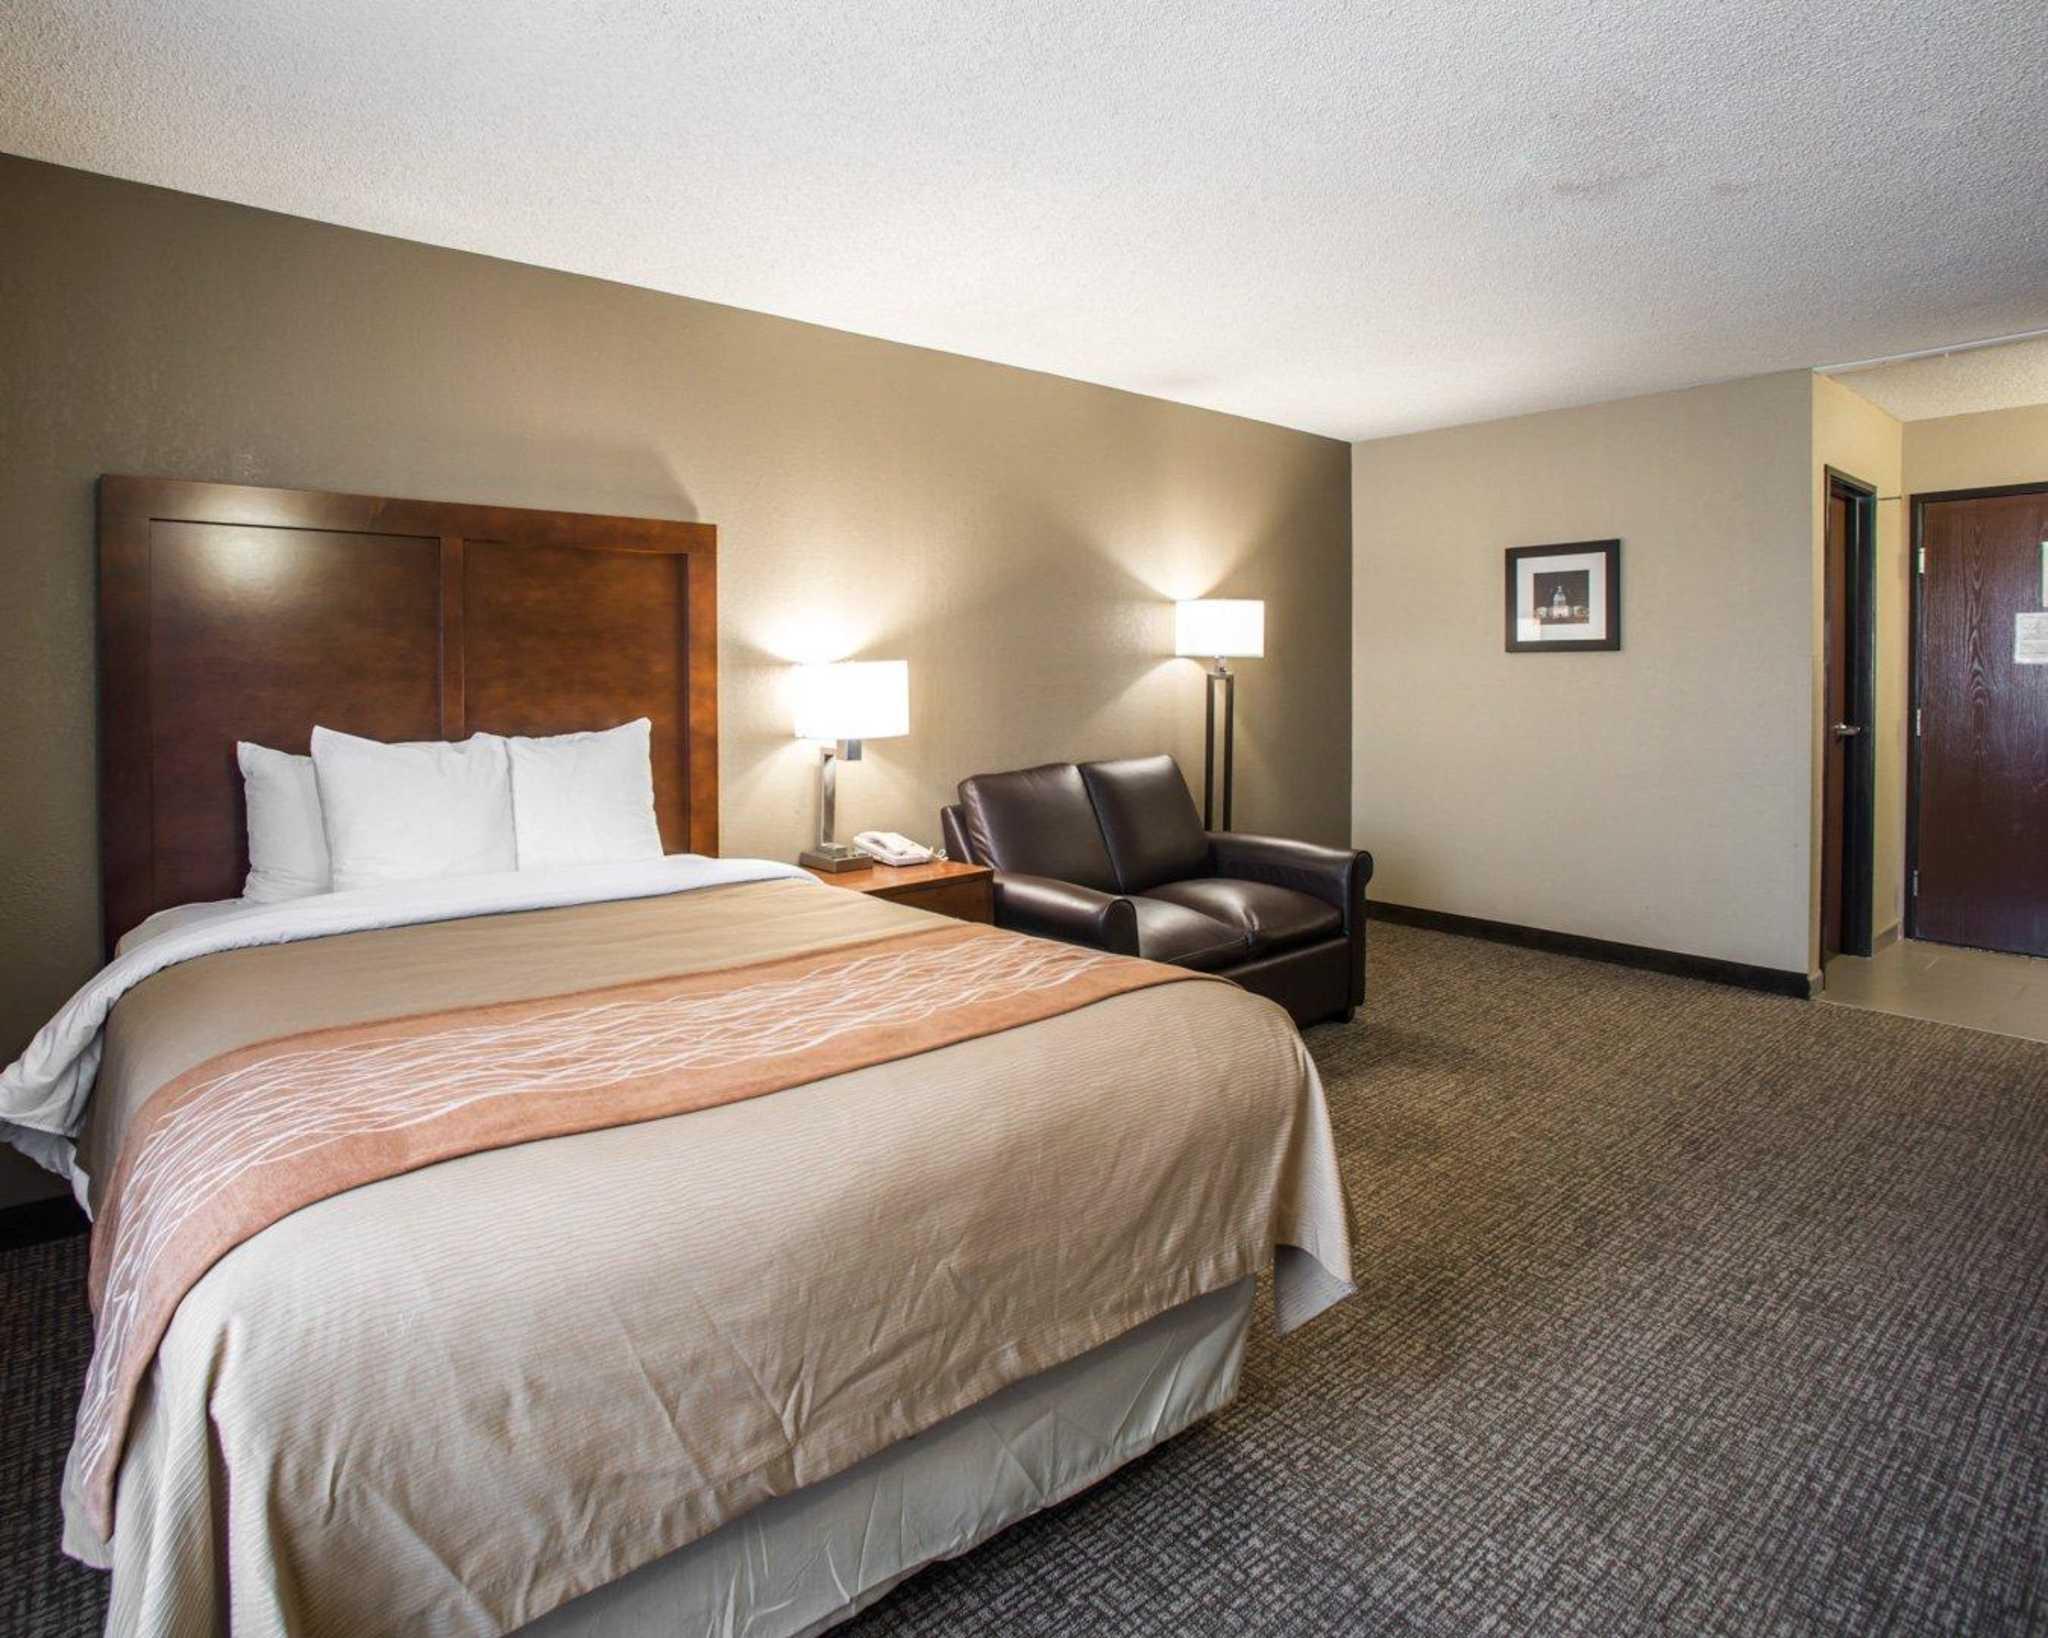 Comfort Inn Amp Suites Hazelwood St Louis Hazelwood Mo